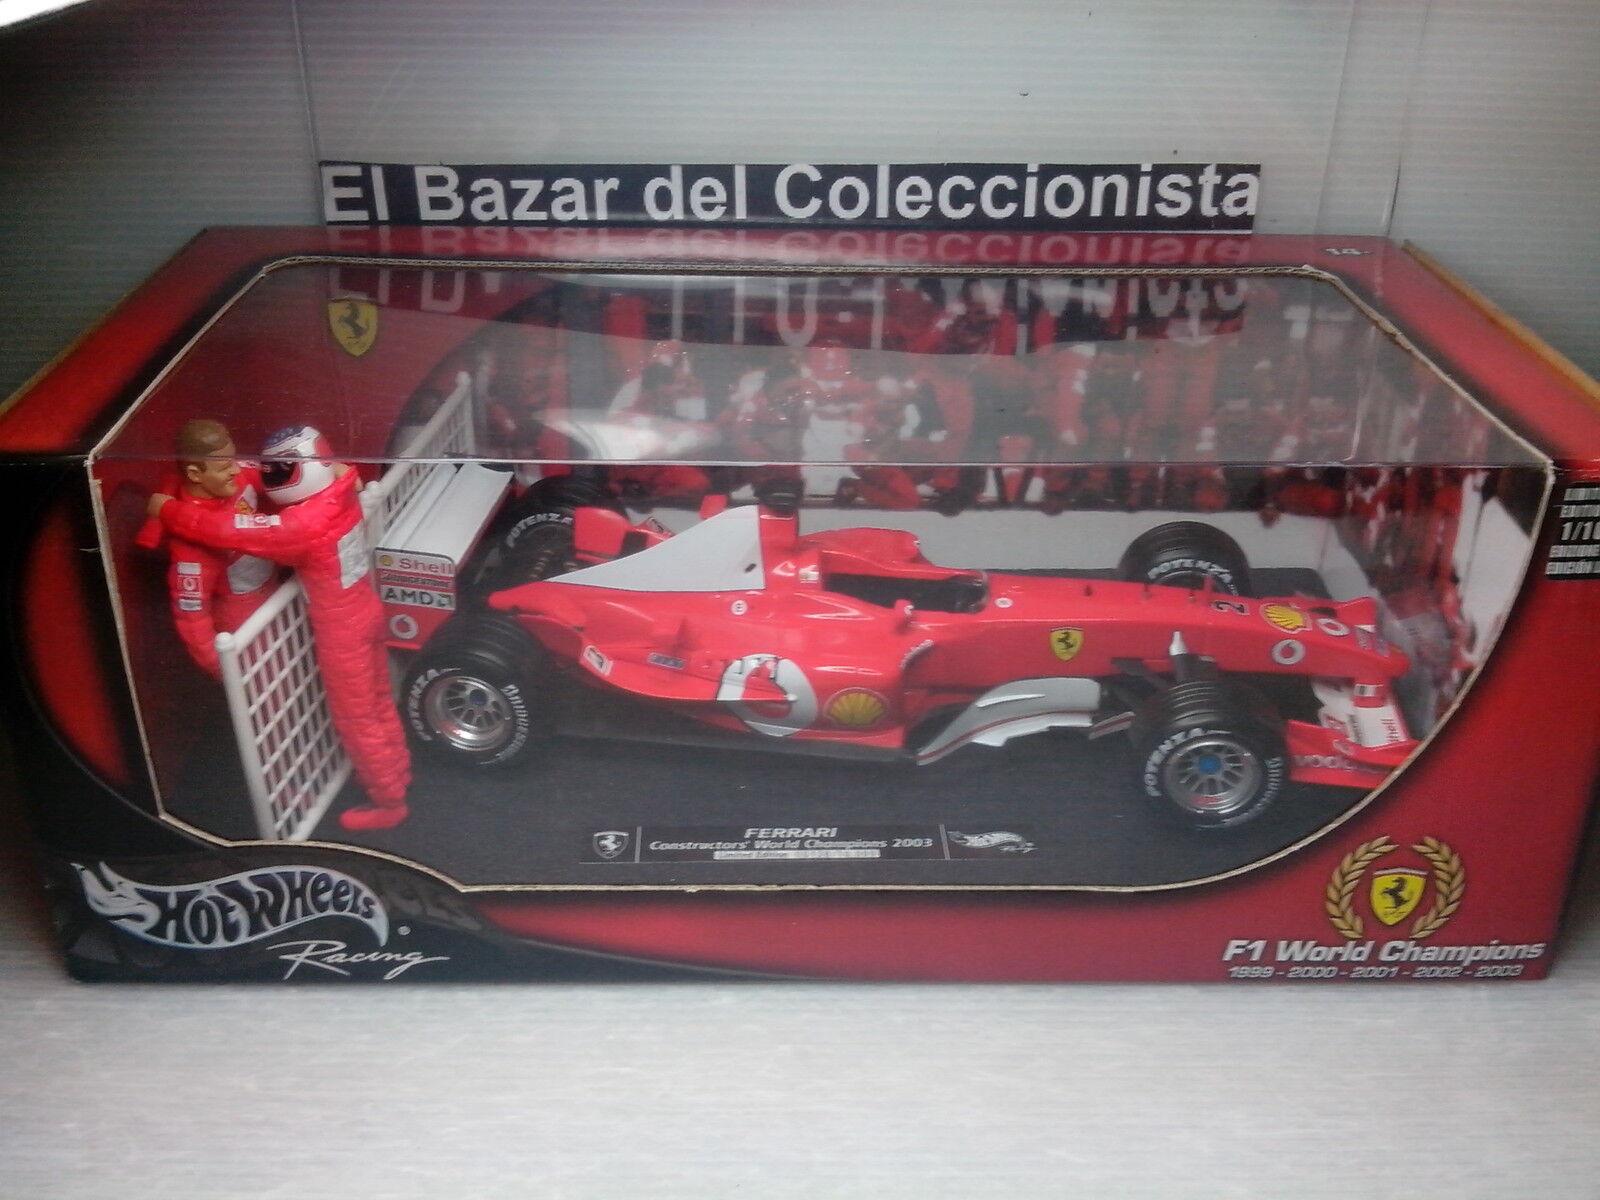 1:18 Ferrari F1 F2003 Schumacher 2003 World Constructor Champions - HW - 3L050